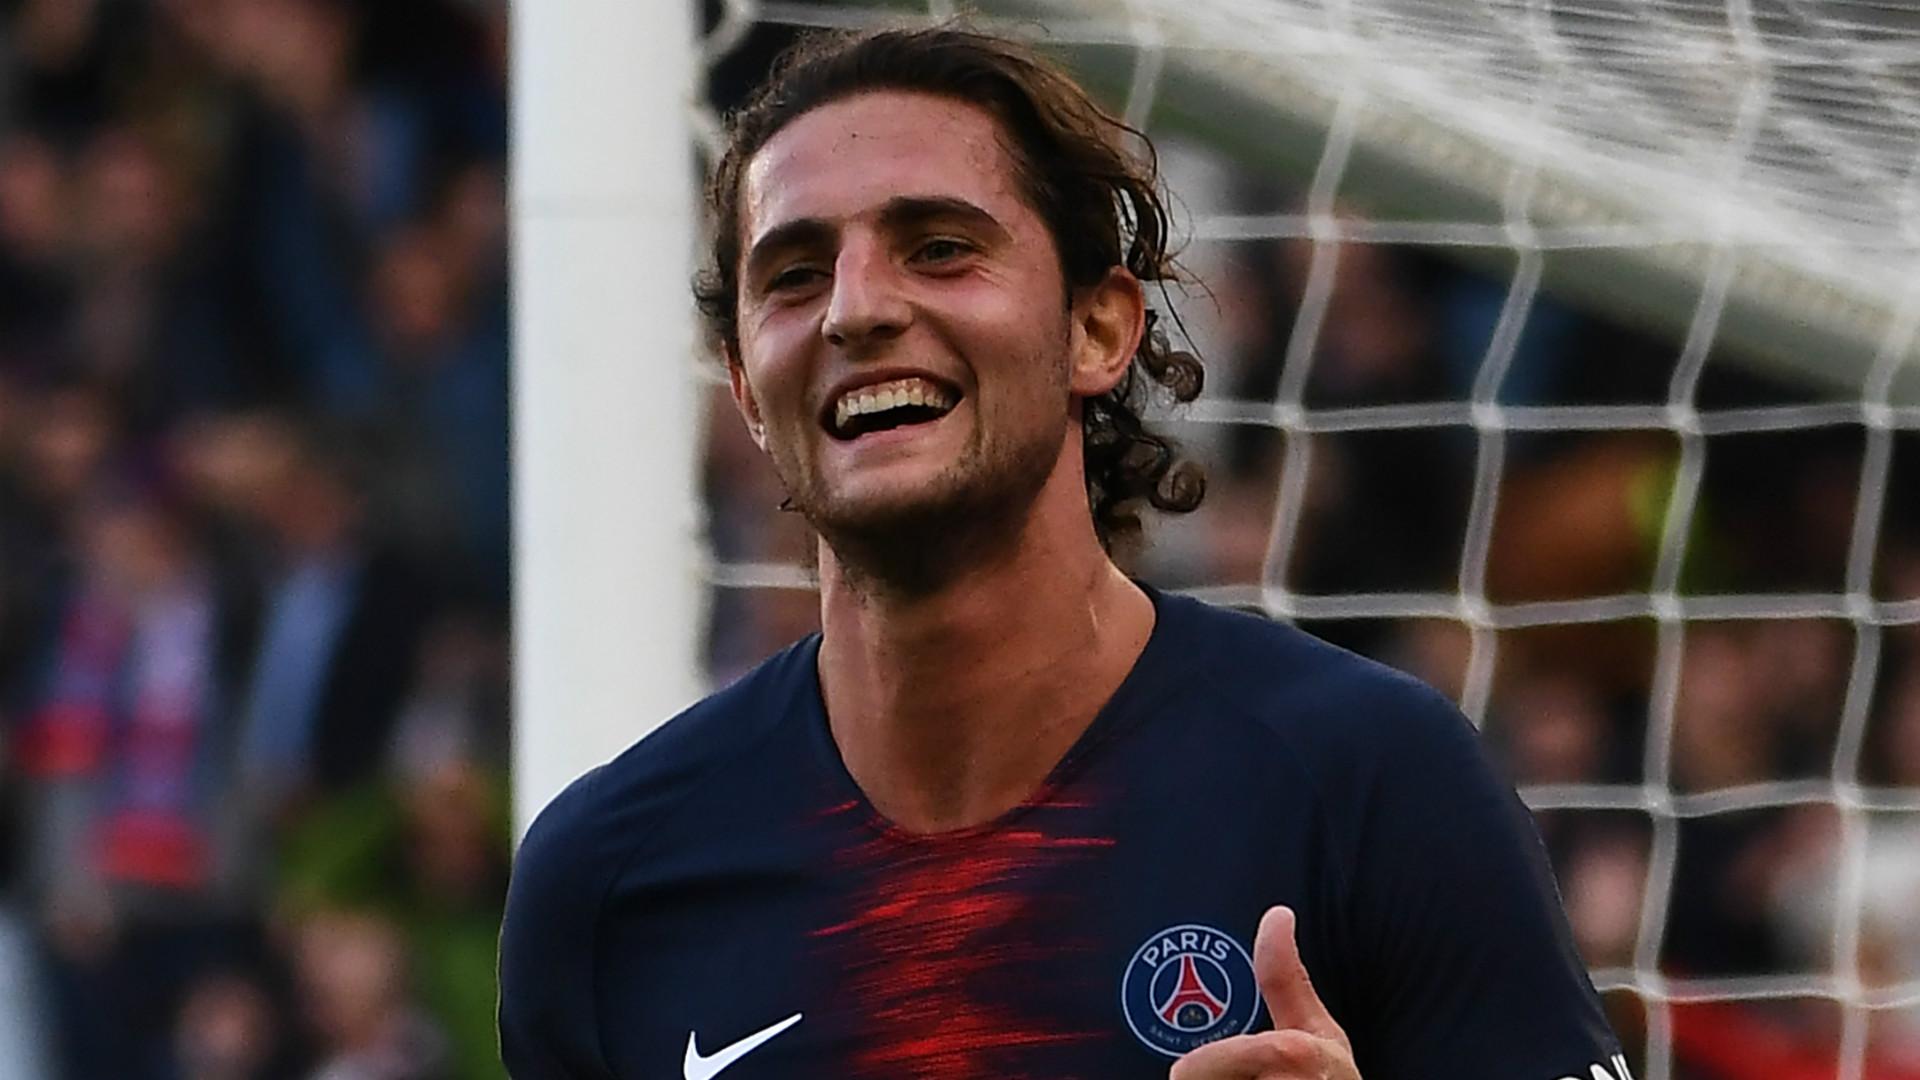 Mercato - La Juventus Turin confirme un rapprochement avec Adrien Rabiot